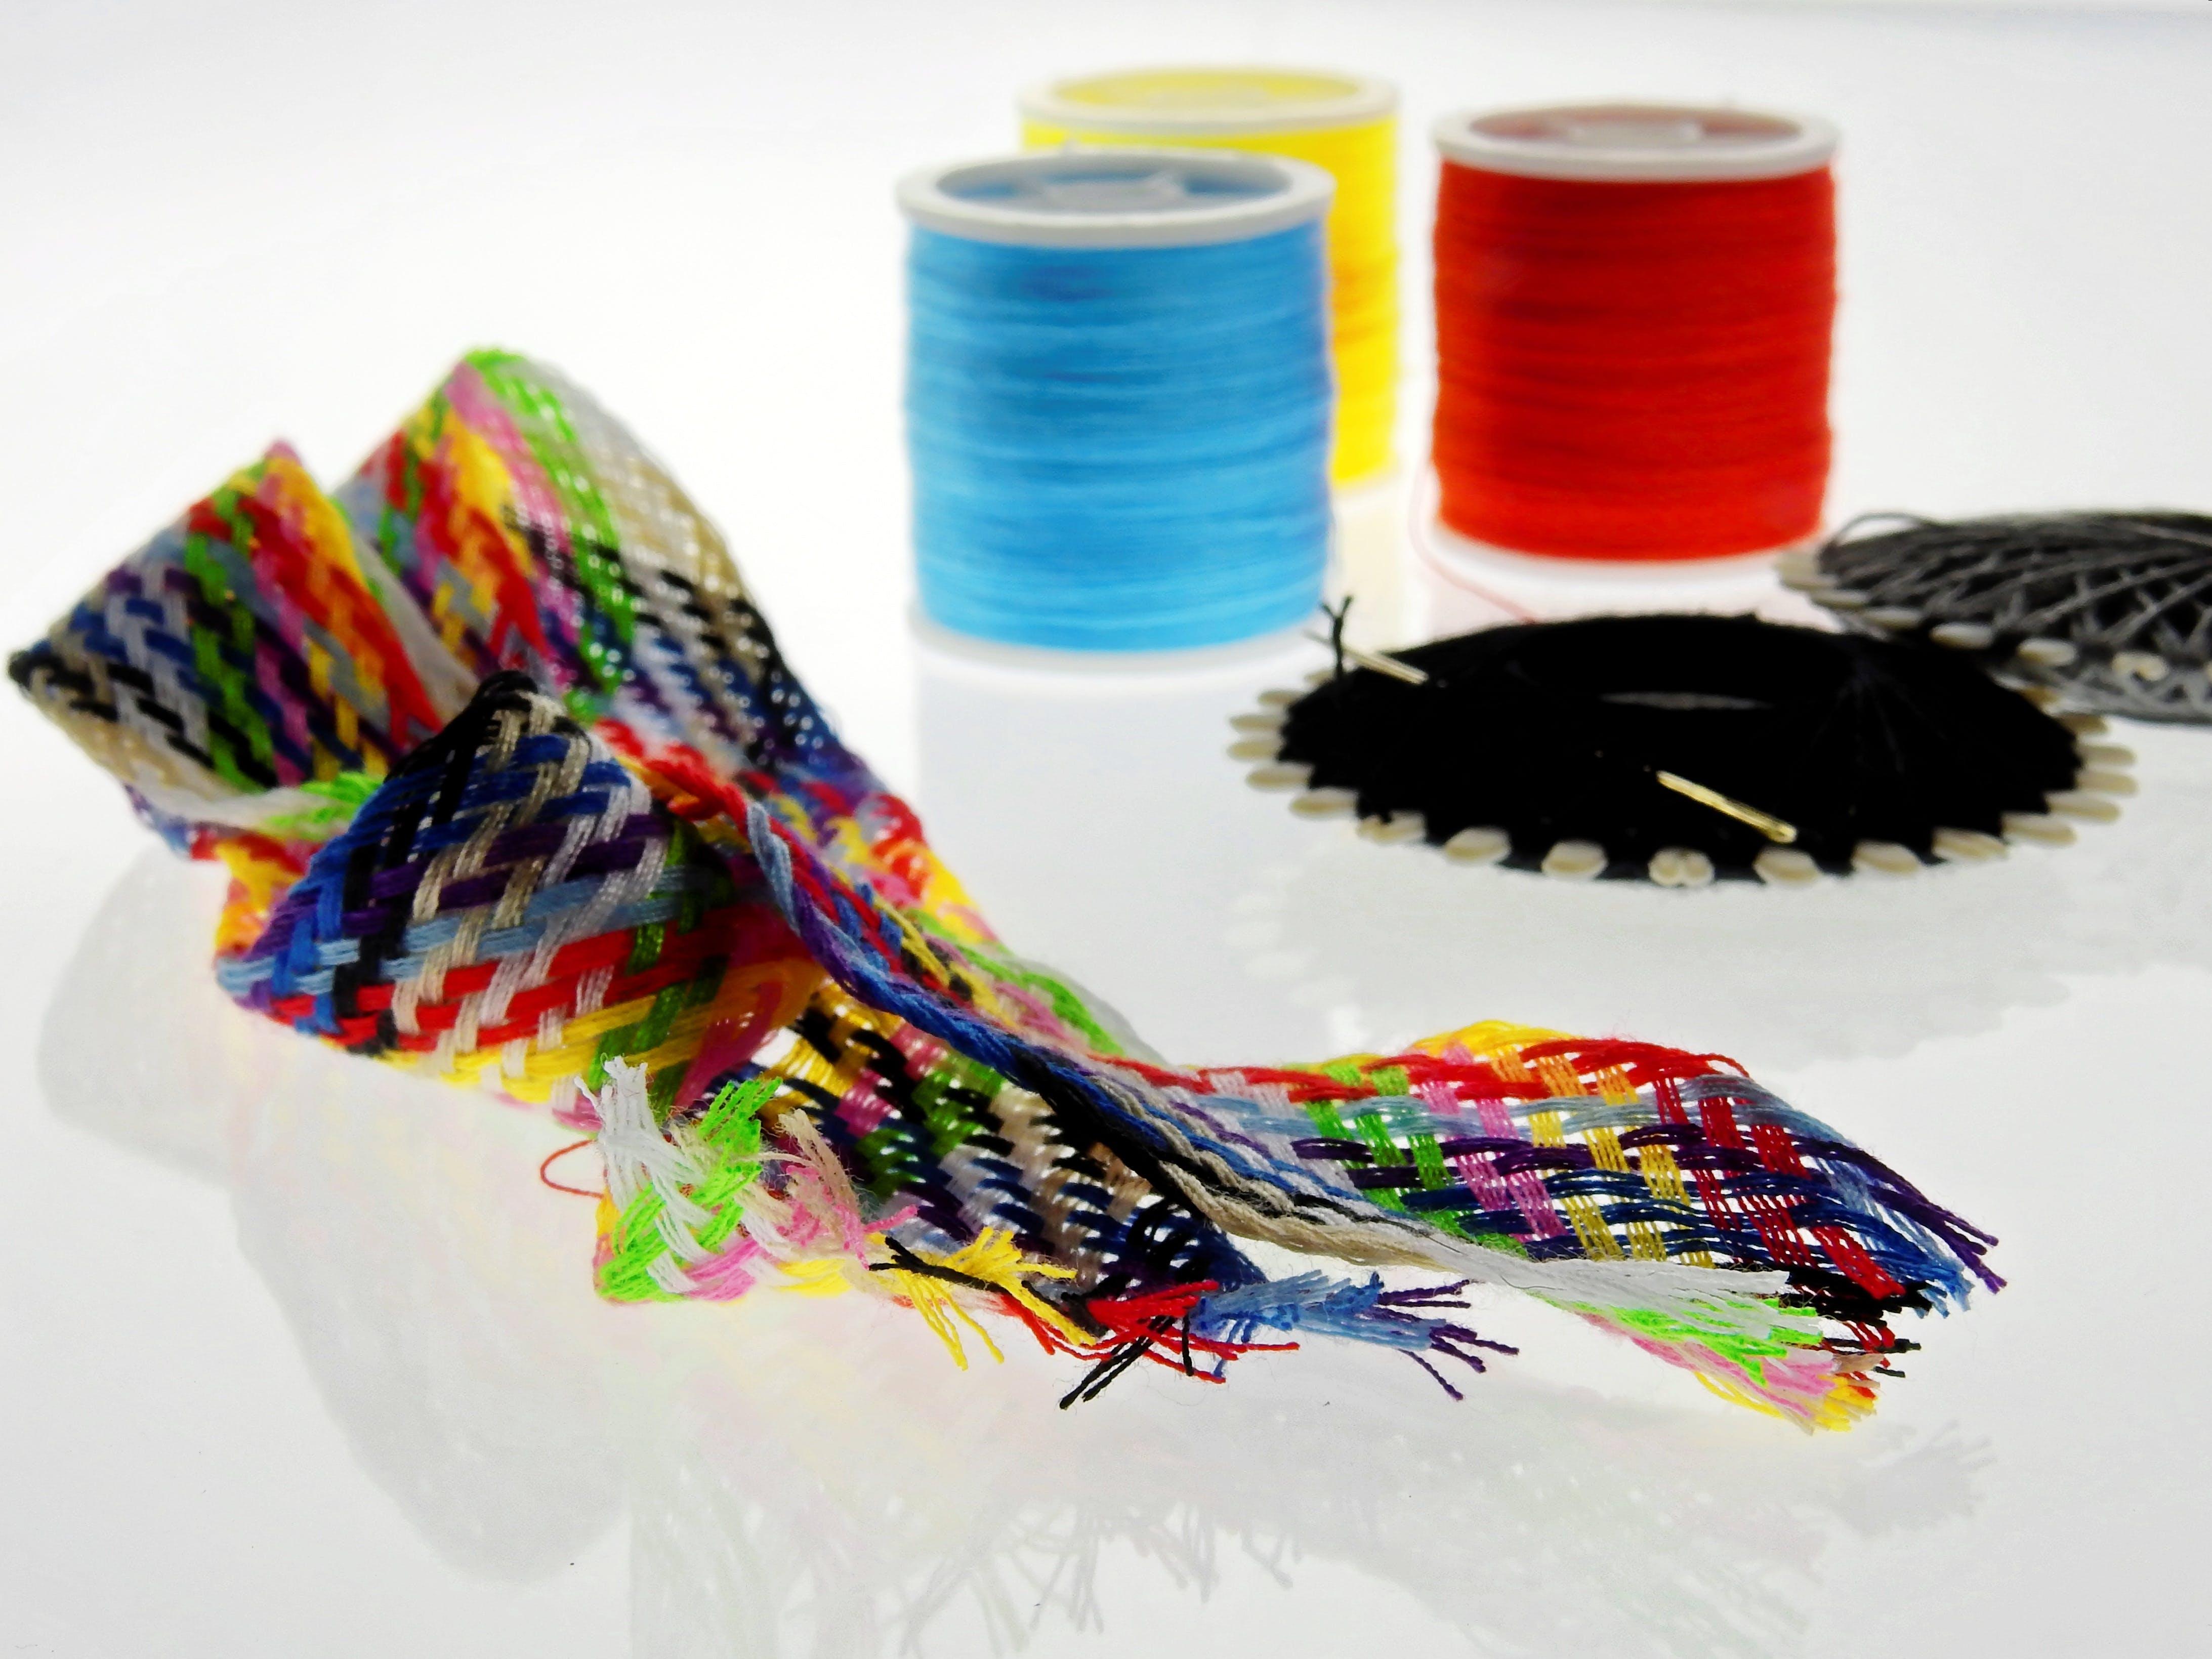 Free stock photo of fashion, creative, colorful, design